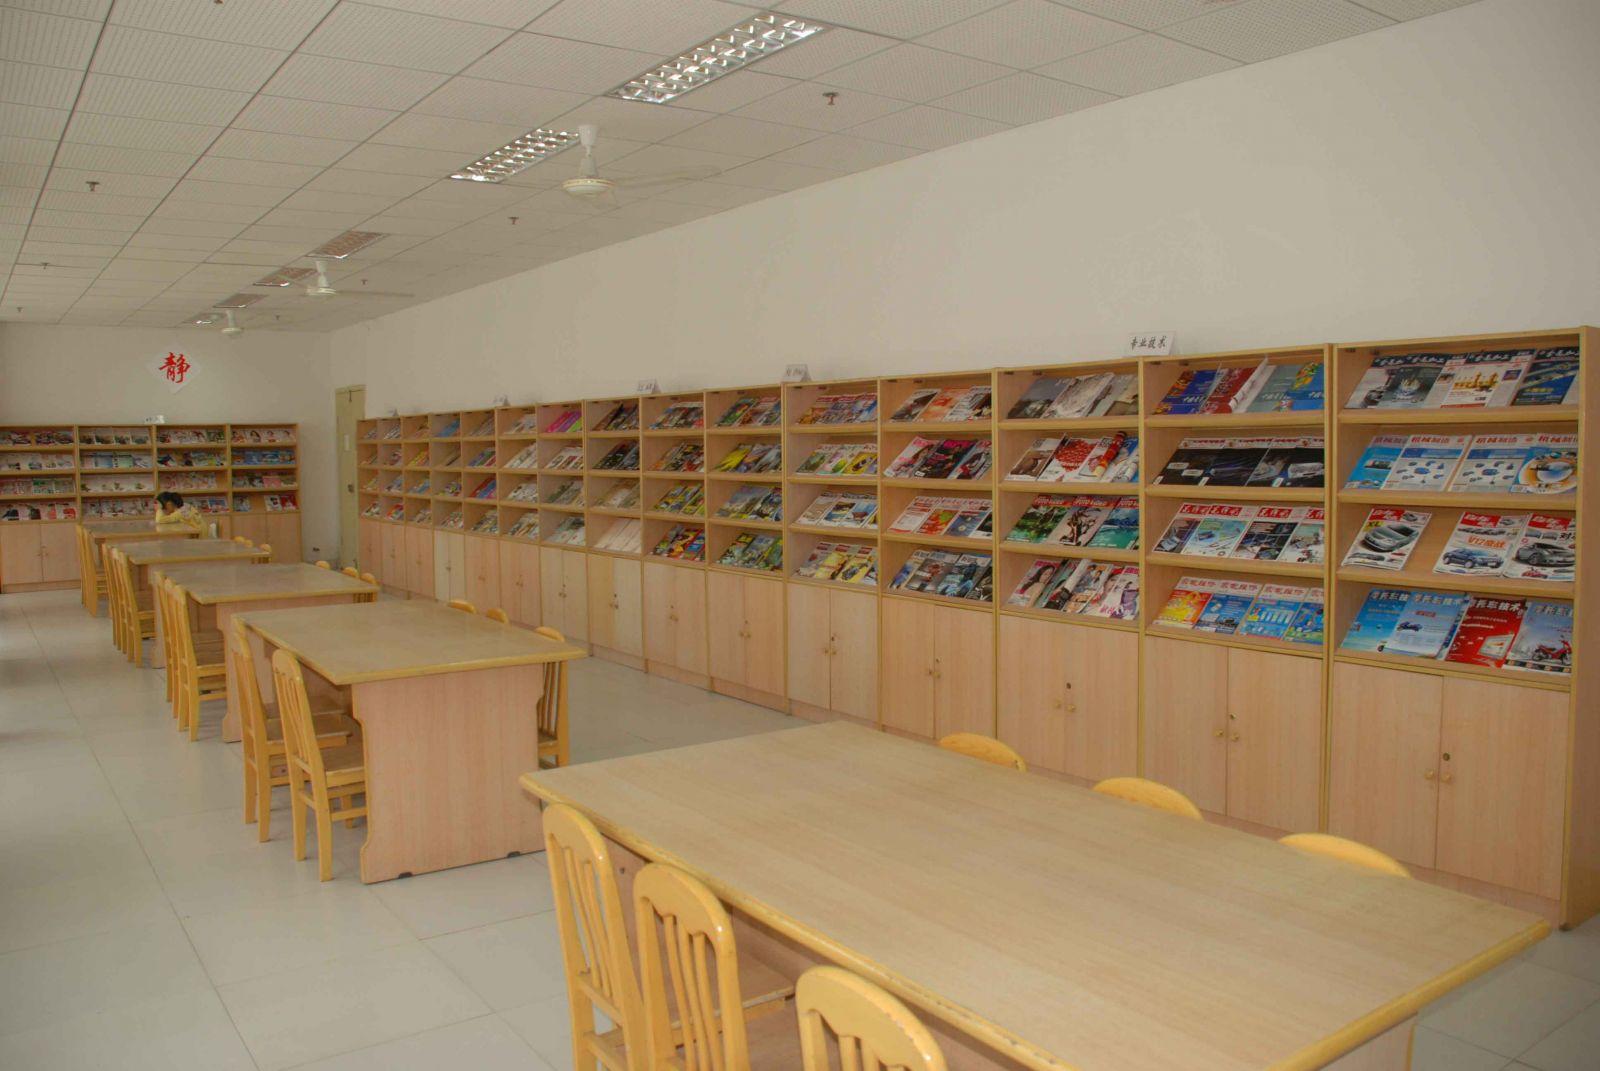 cn 中职学校图书馆建设存在的问题及对策              我开学上中专